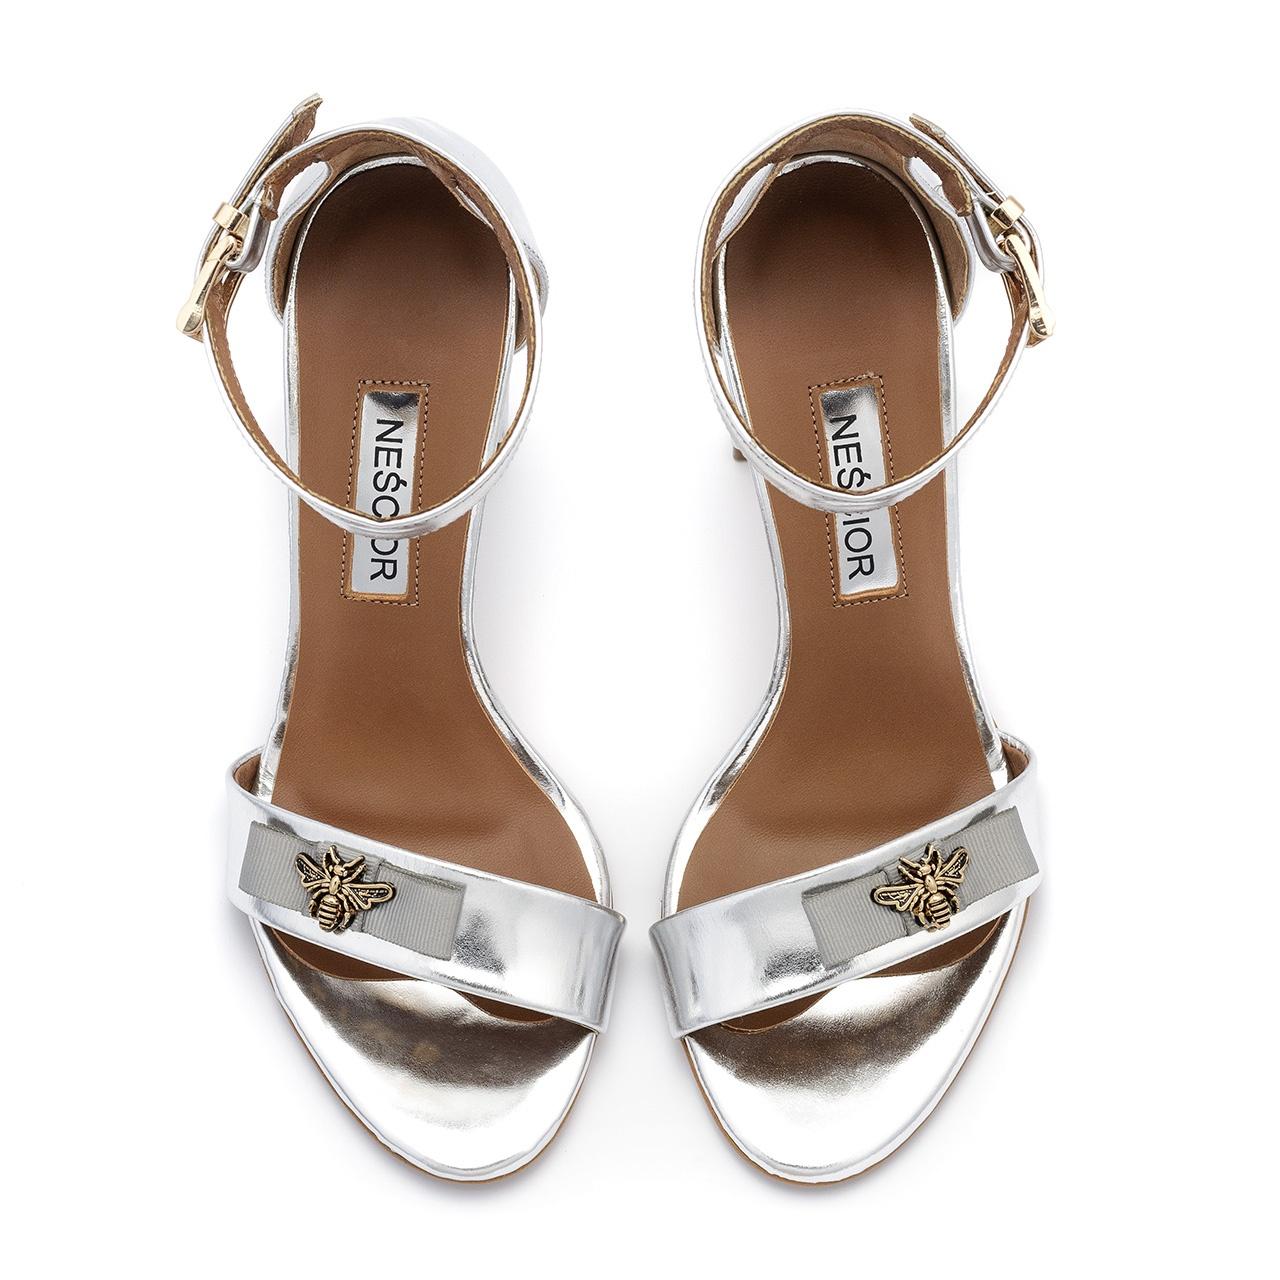 f065a9b7206b4 Srebrne skórzane sandały na słupku; Srebrne skórzane sandały na słupku ...